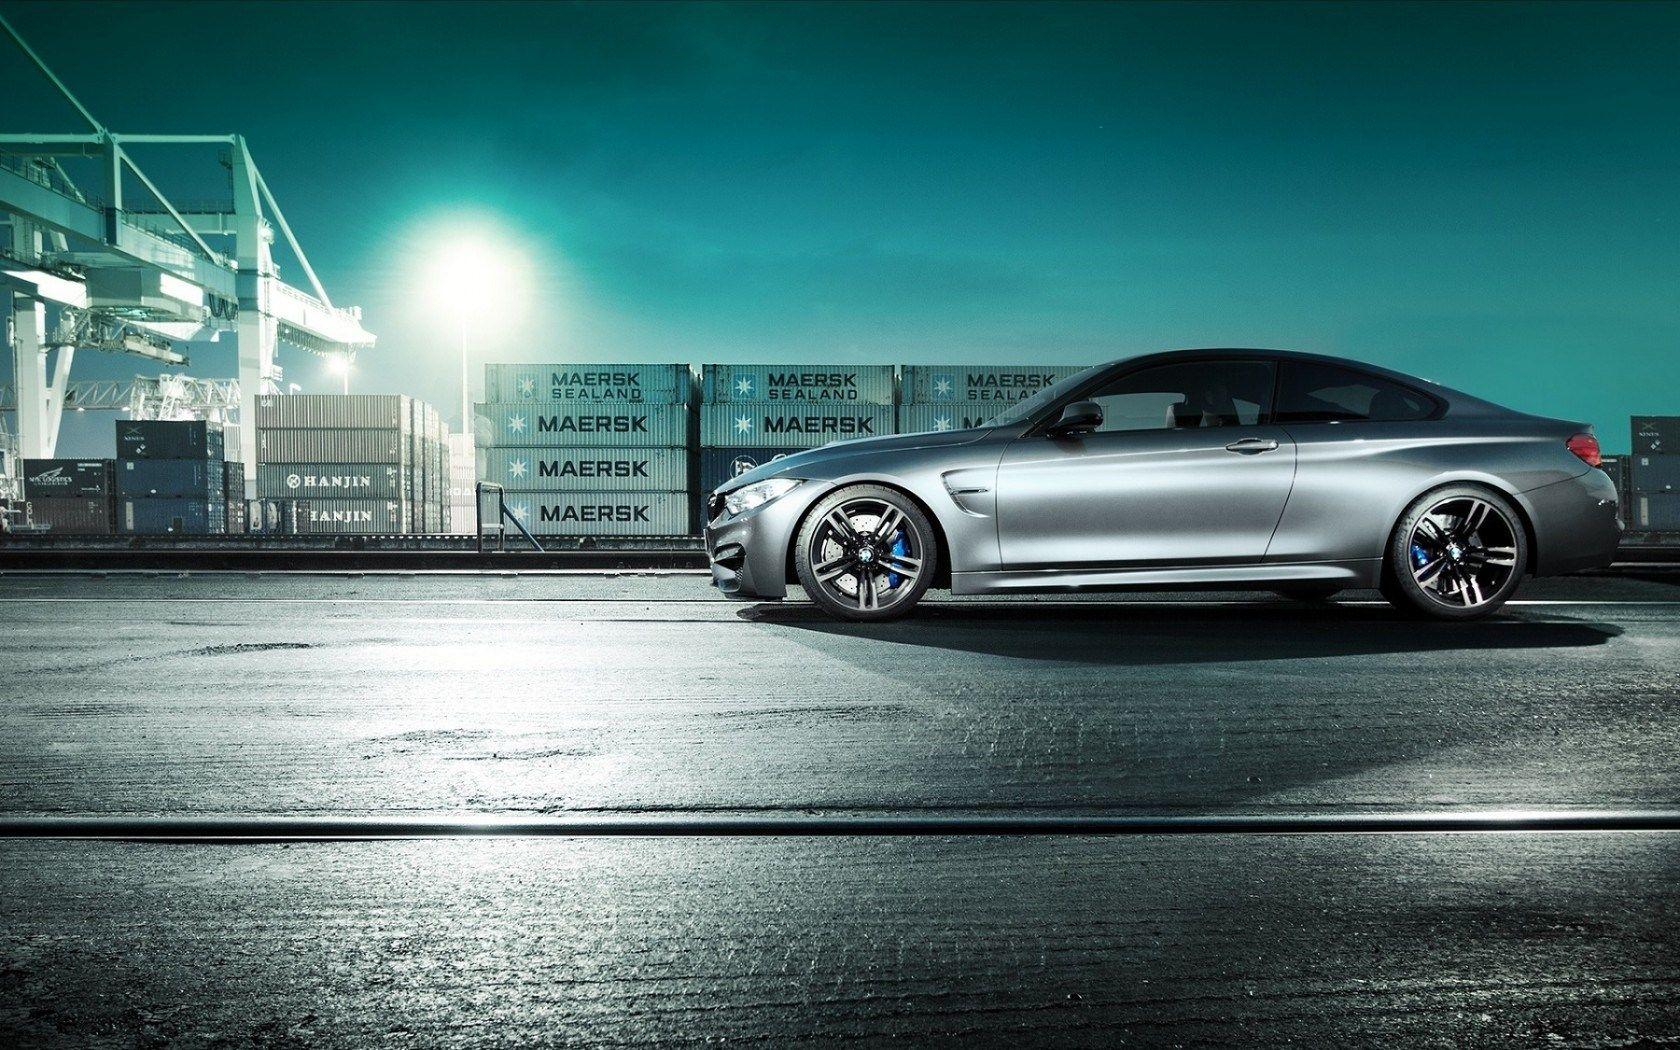 Bmw F82 Car Hd Wallpaper Expensive Cars Hd Wallpaper Images 1080p